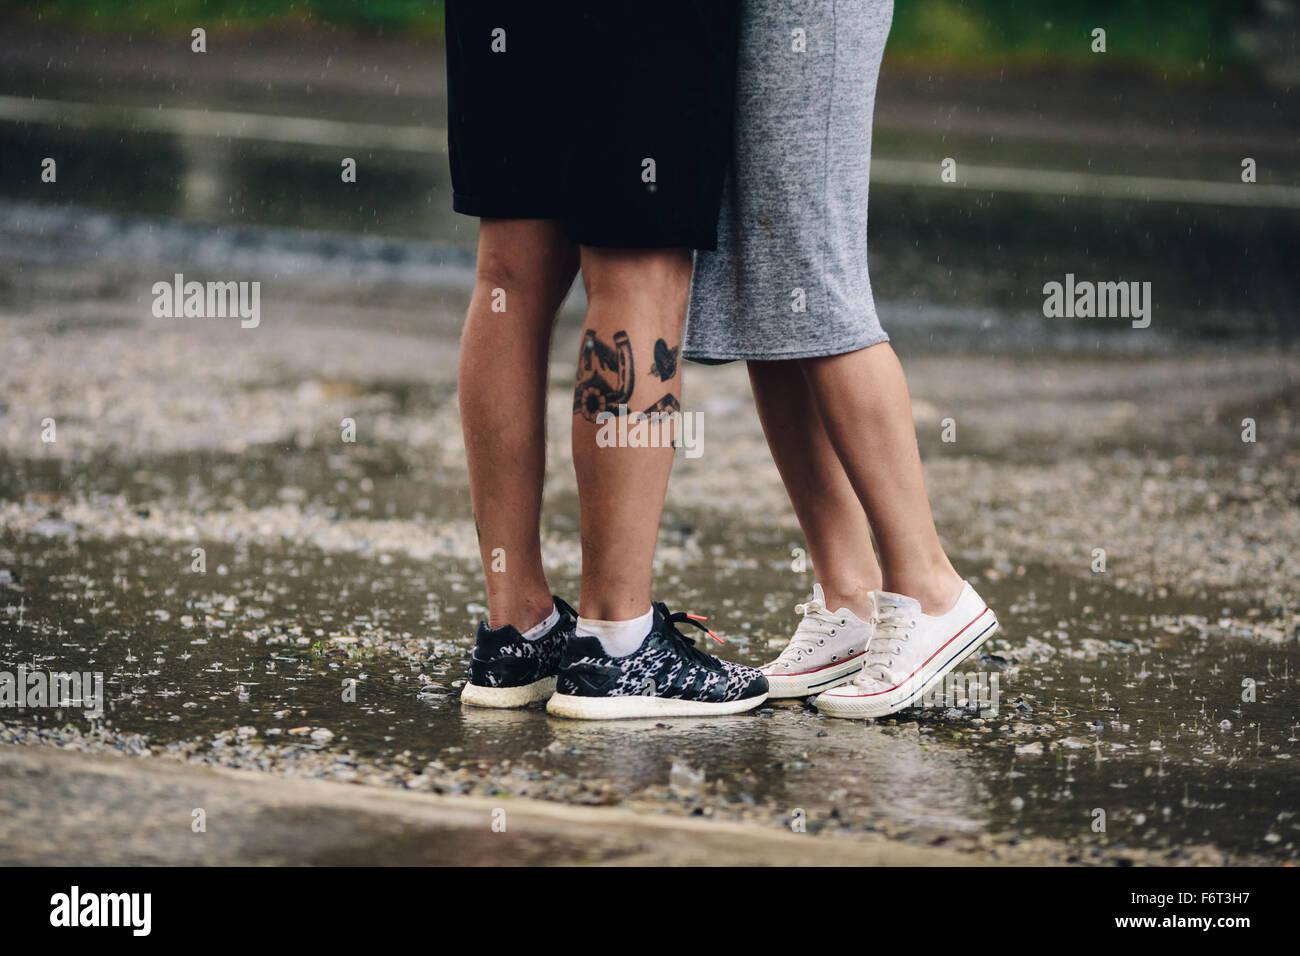 couple on the background of wet asphalt - Stock Image